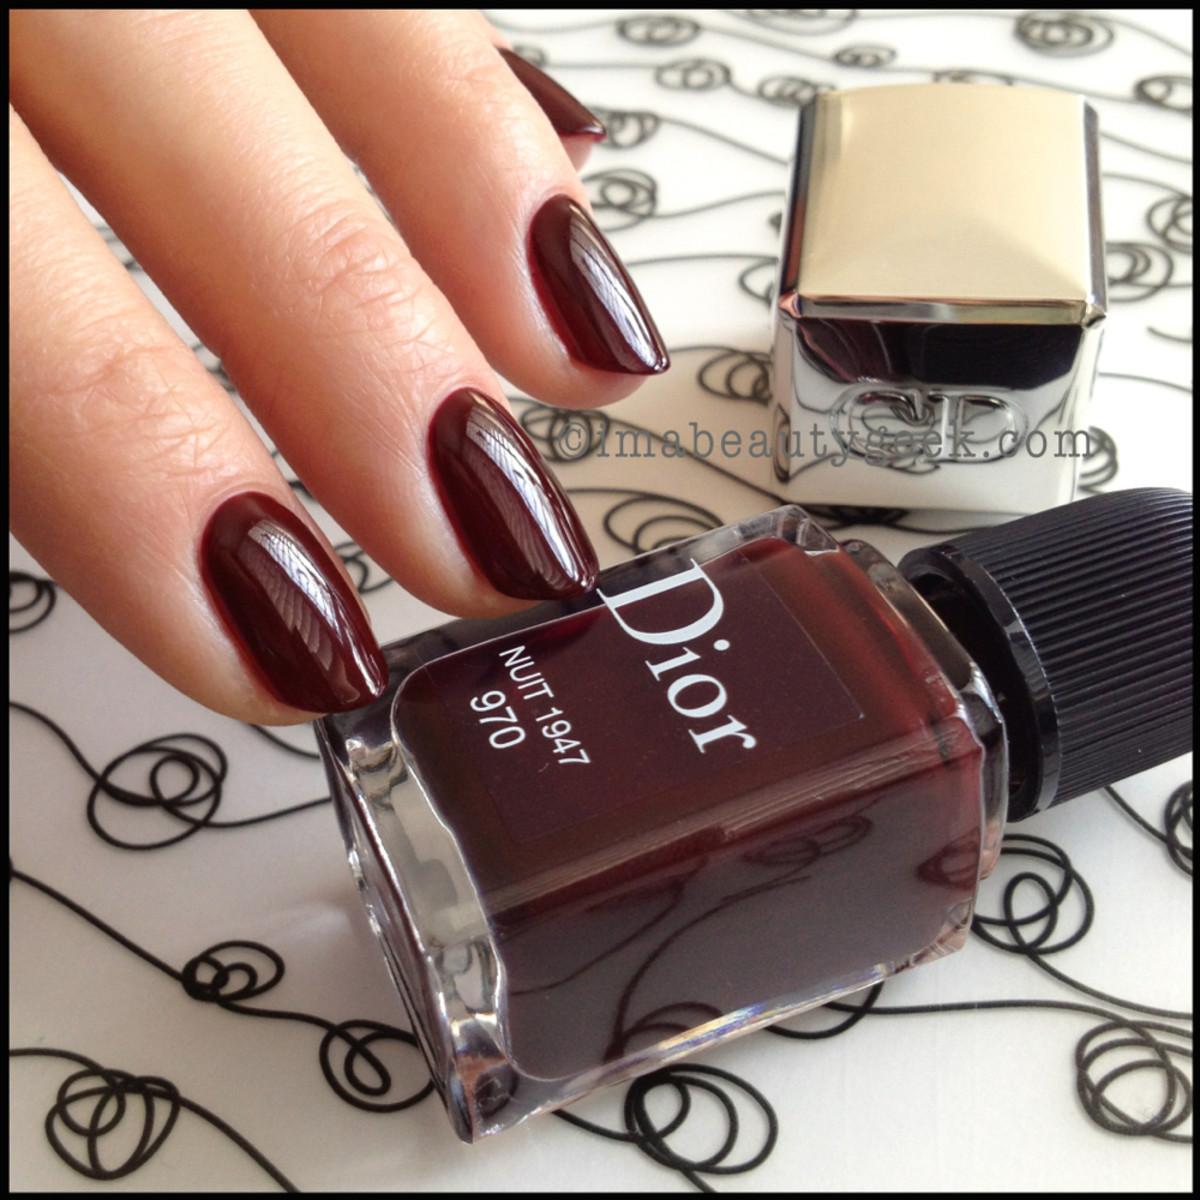 Dior polish Nuit 1947 970_Dior Gel Shine